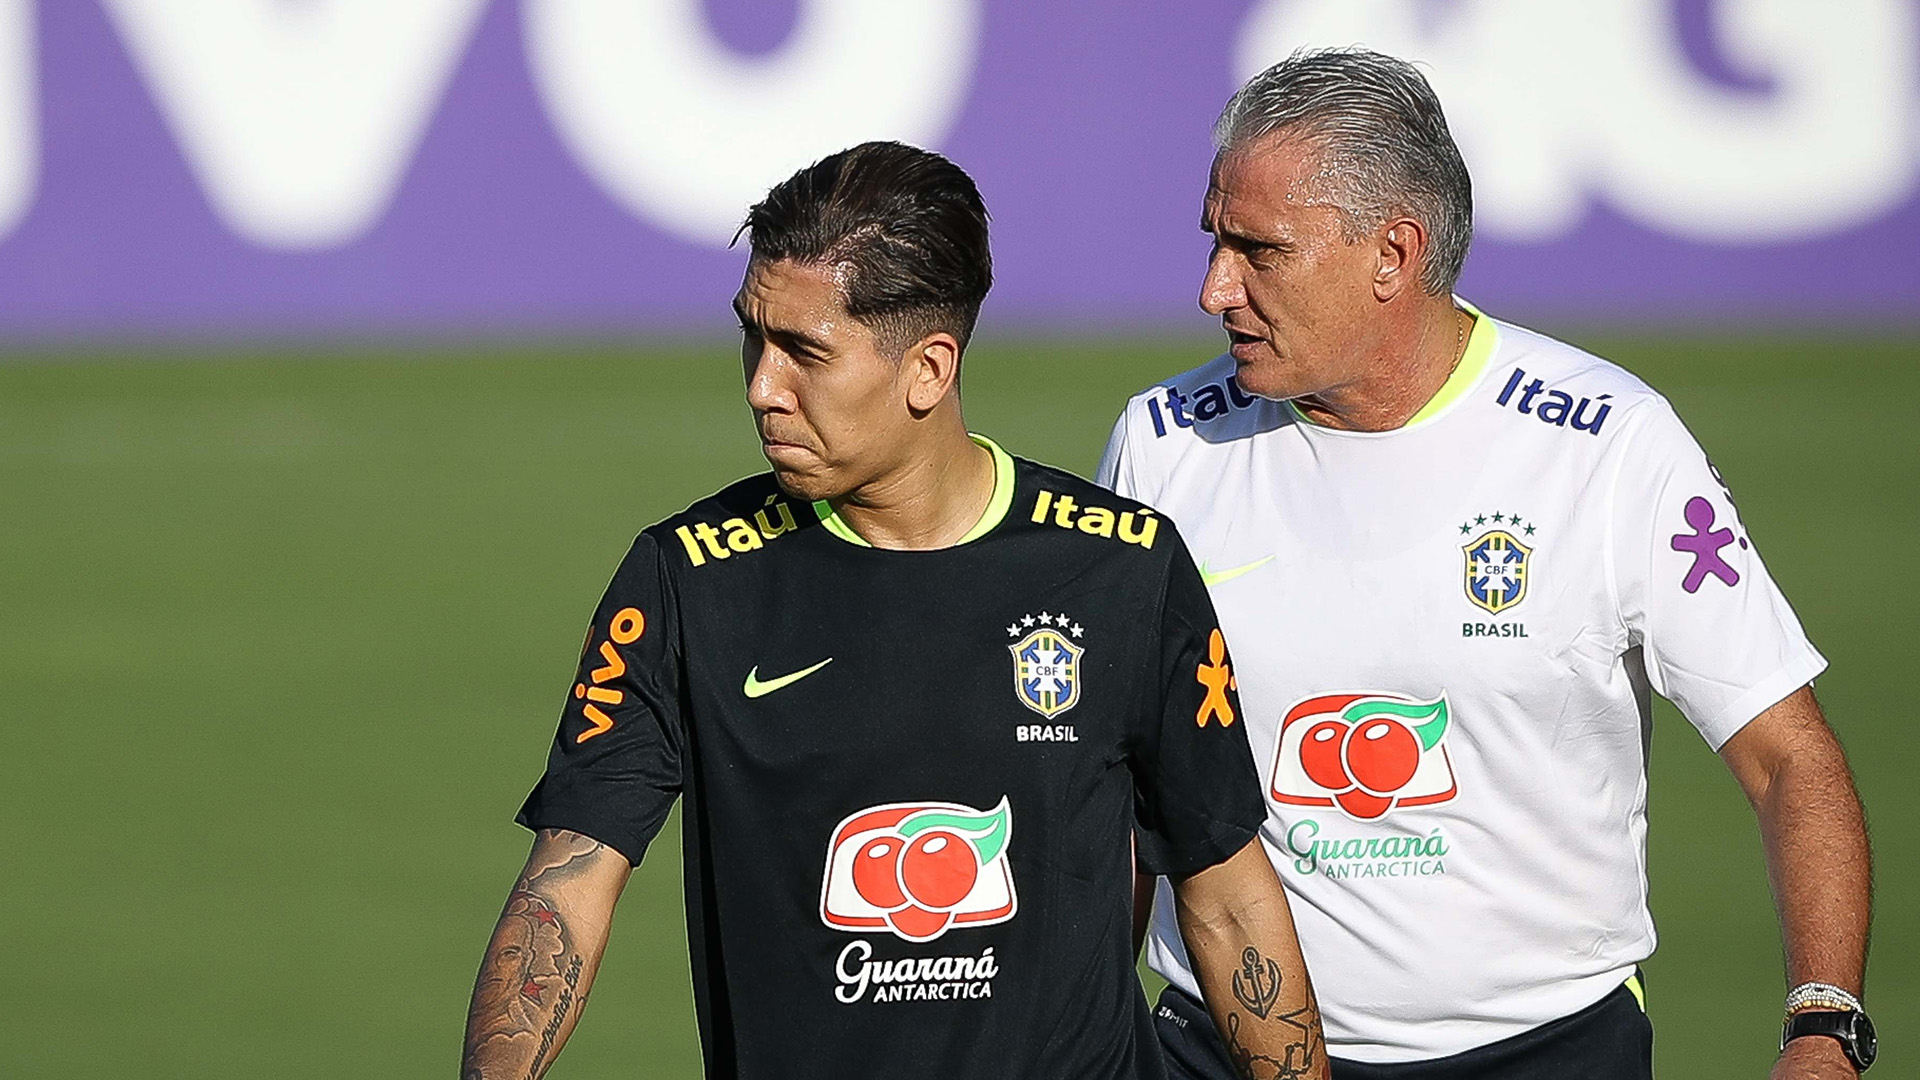 Paulinho hat-trick as Brazil thrash Uruguay